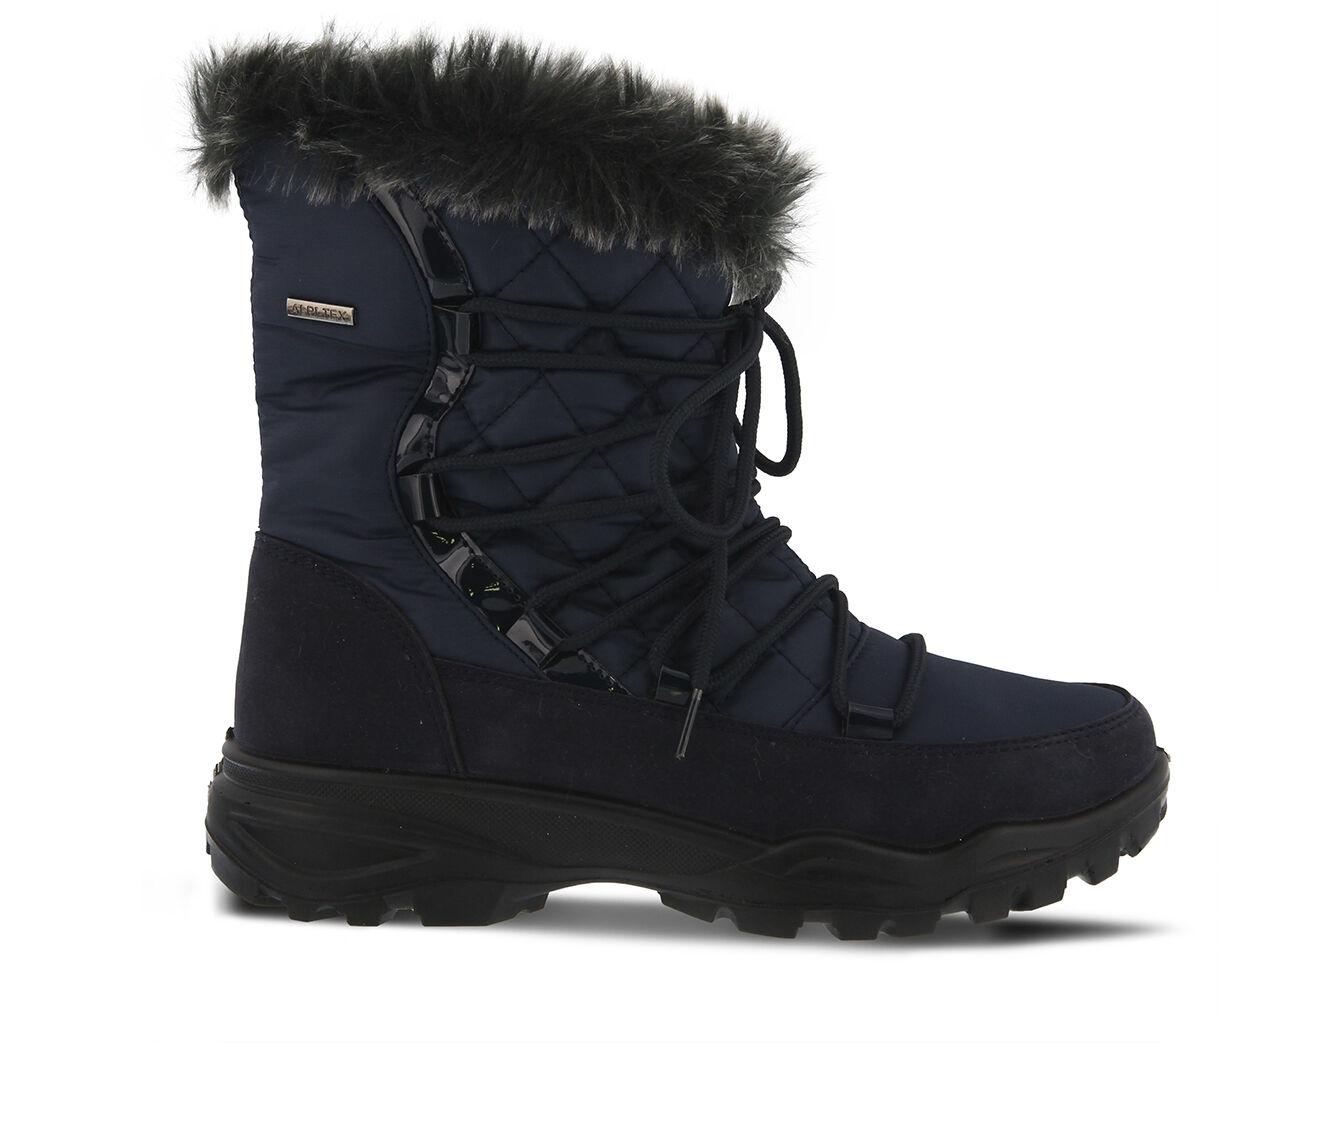 Women's FLEXUS Denilia Winter Boots Navy